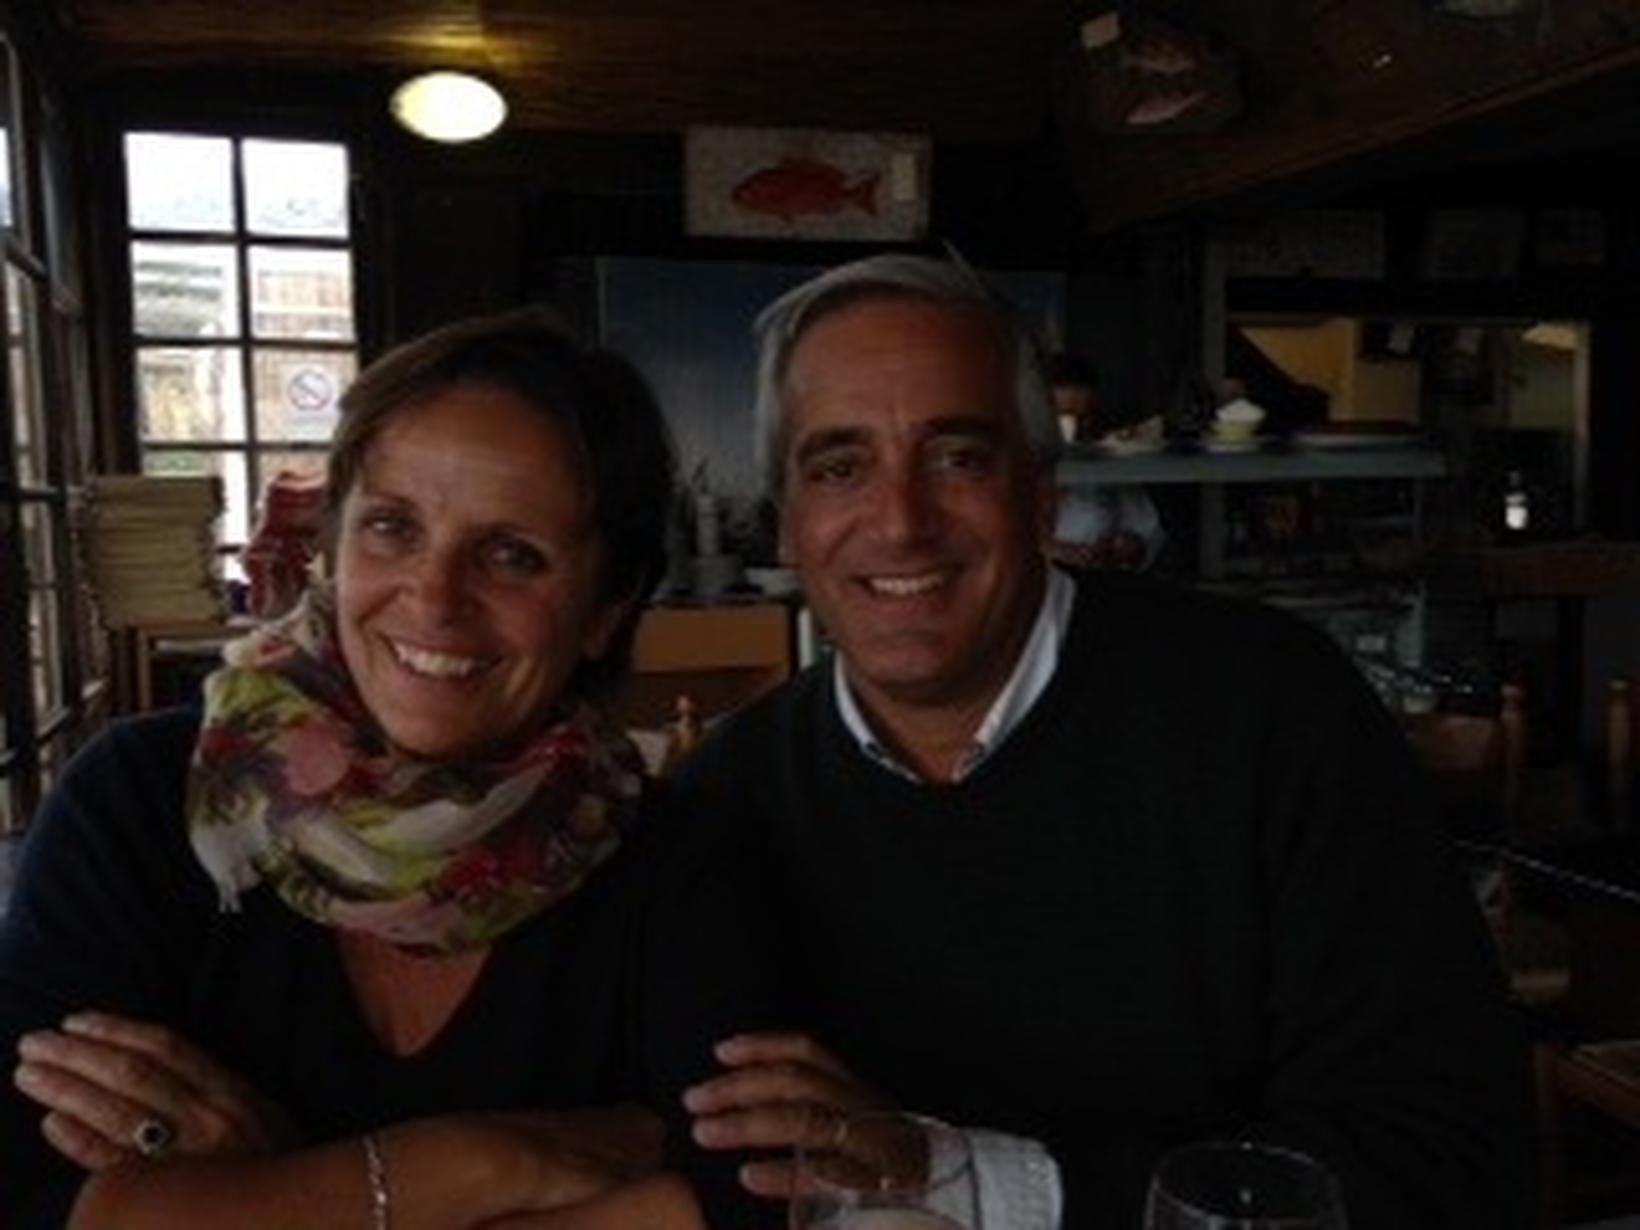 Frederique & Allwyn from Garéoult, France